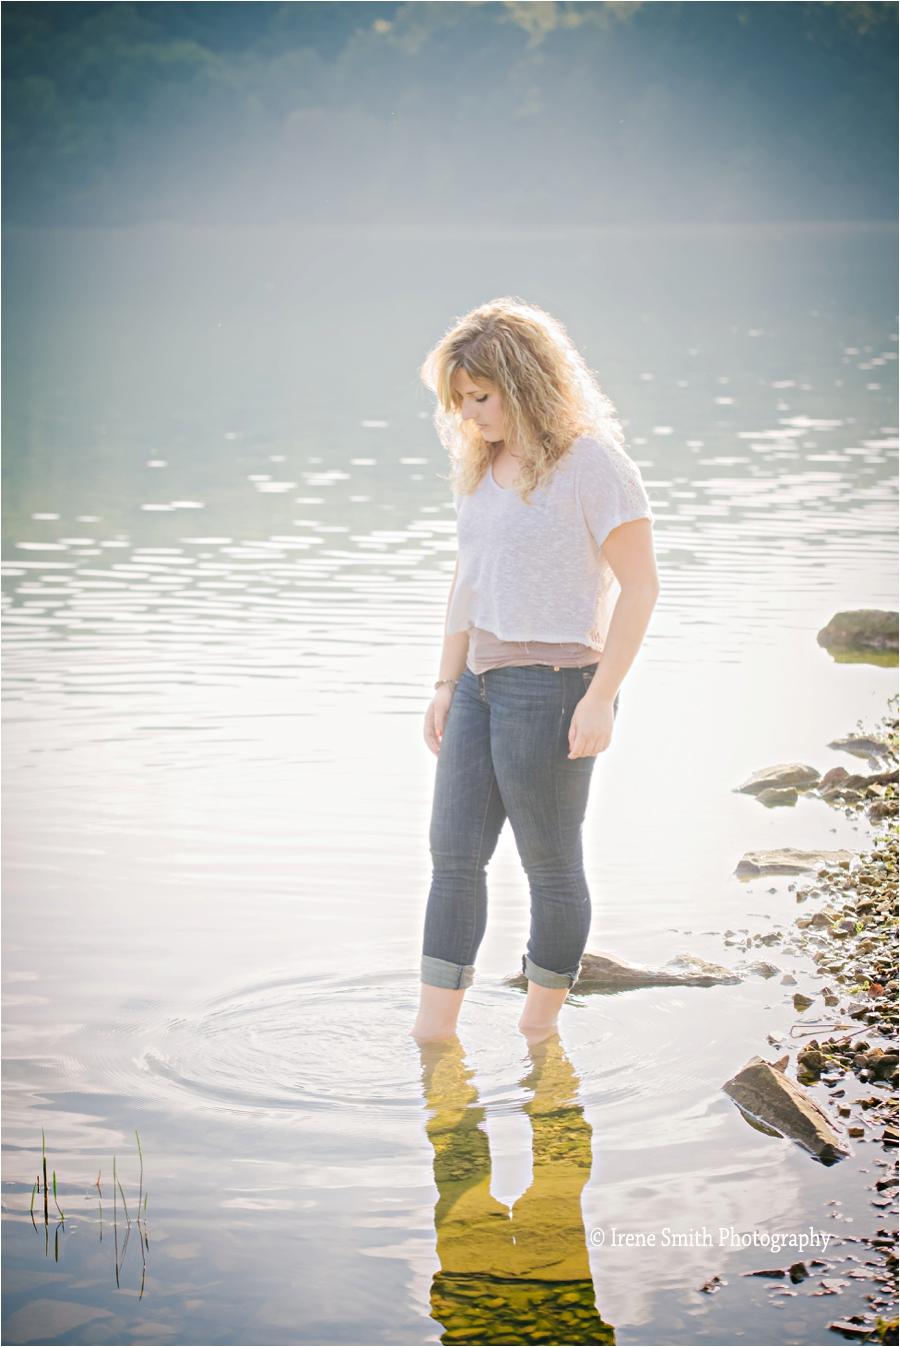 Irene-Smith-Photography-Franklin-Oil-City-Pennsylvania_0068